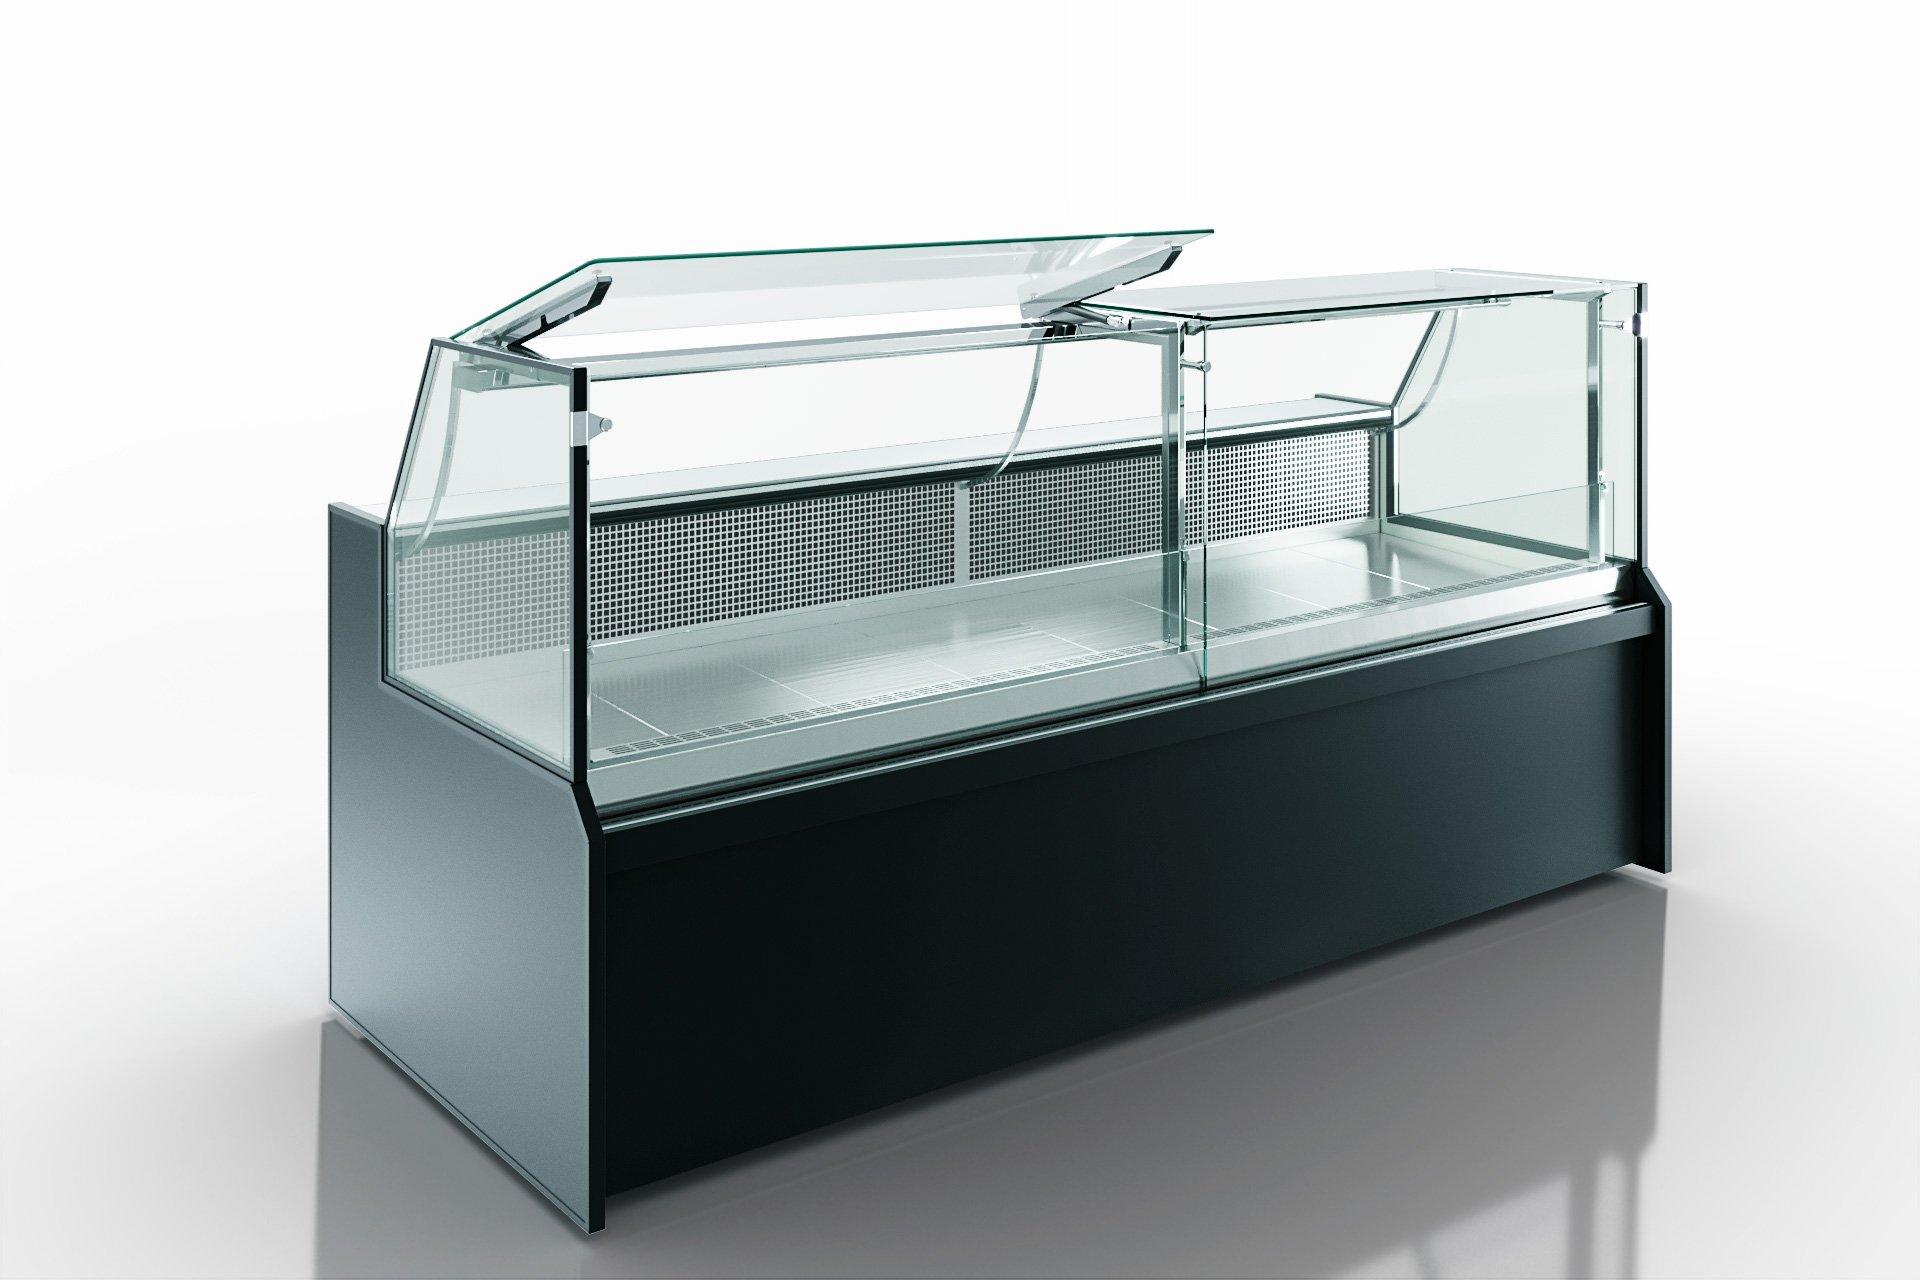 Refrigeration сounters Missouri MC 100 deli PP 130-SBM/SBA